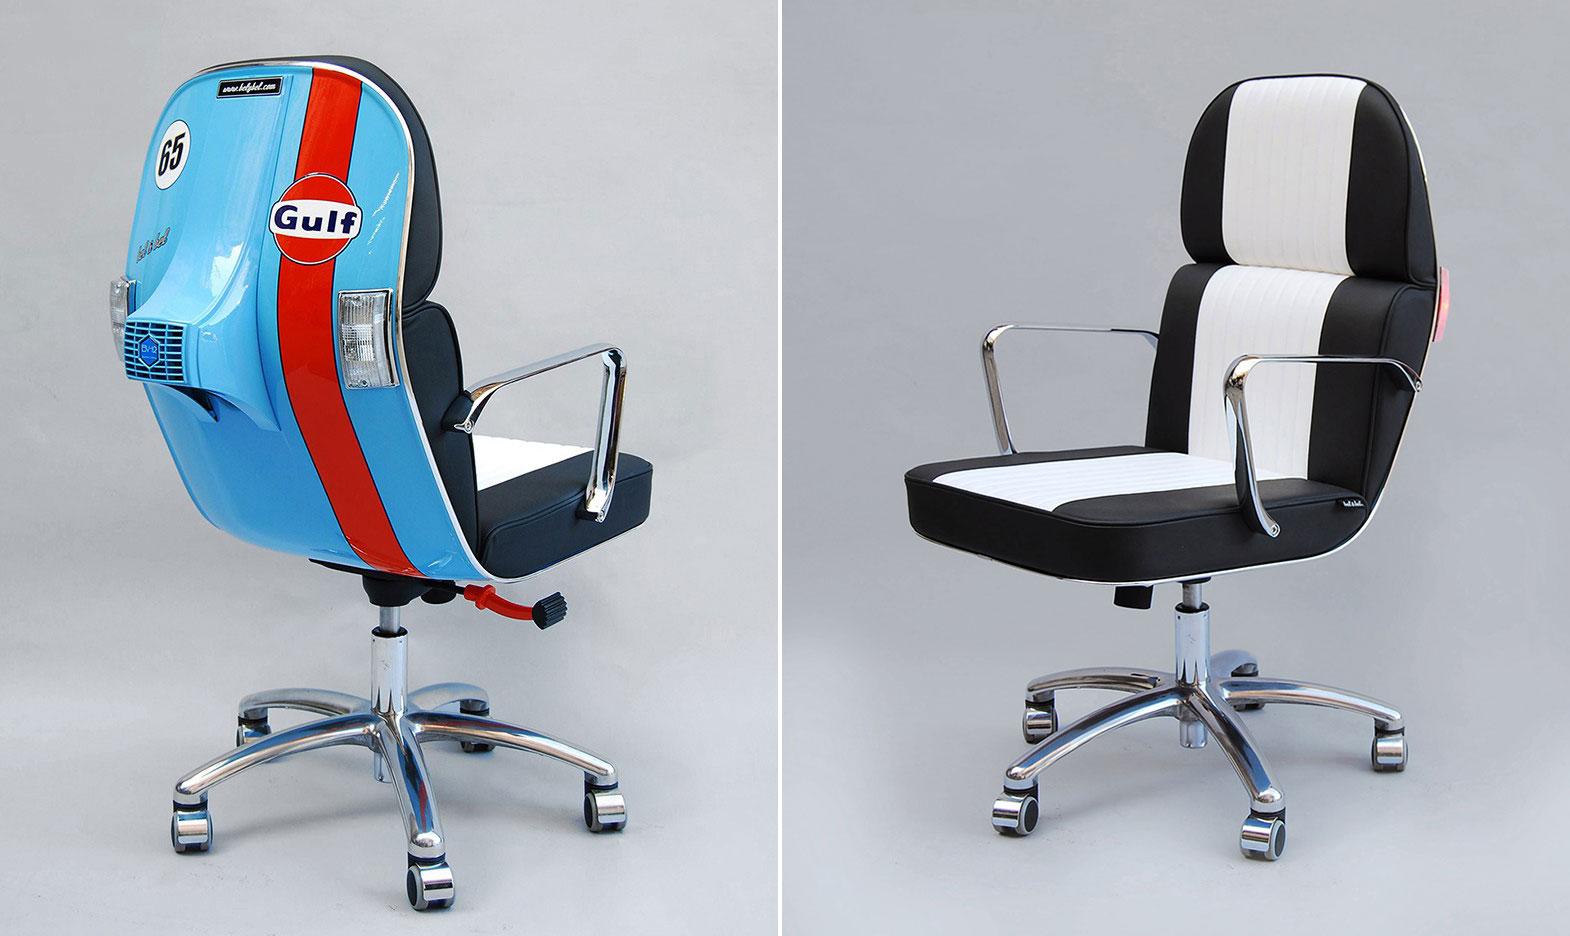 stylish high chair dining seat protectors bel and transform lifeless vespas into italian